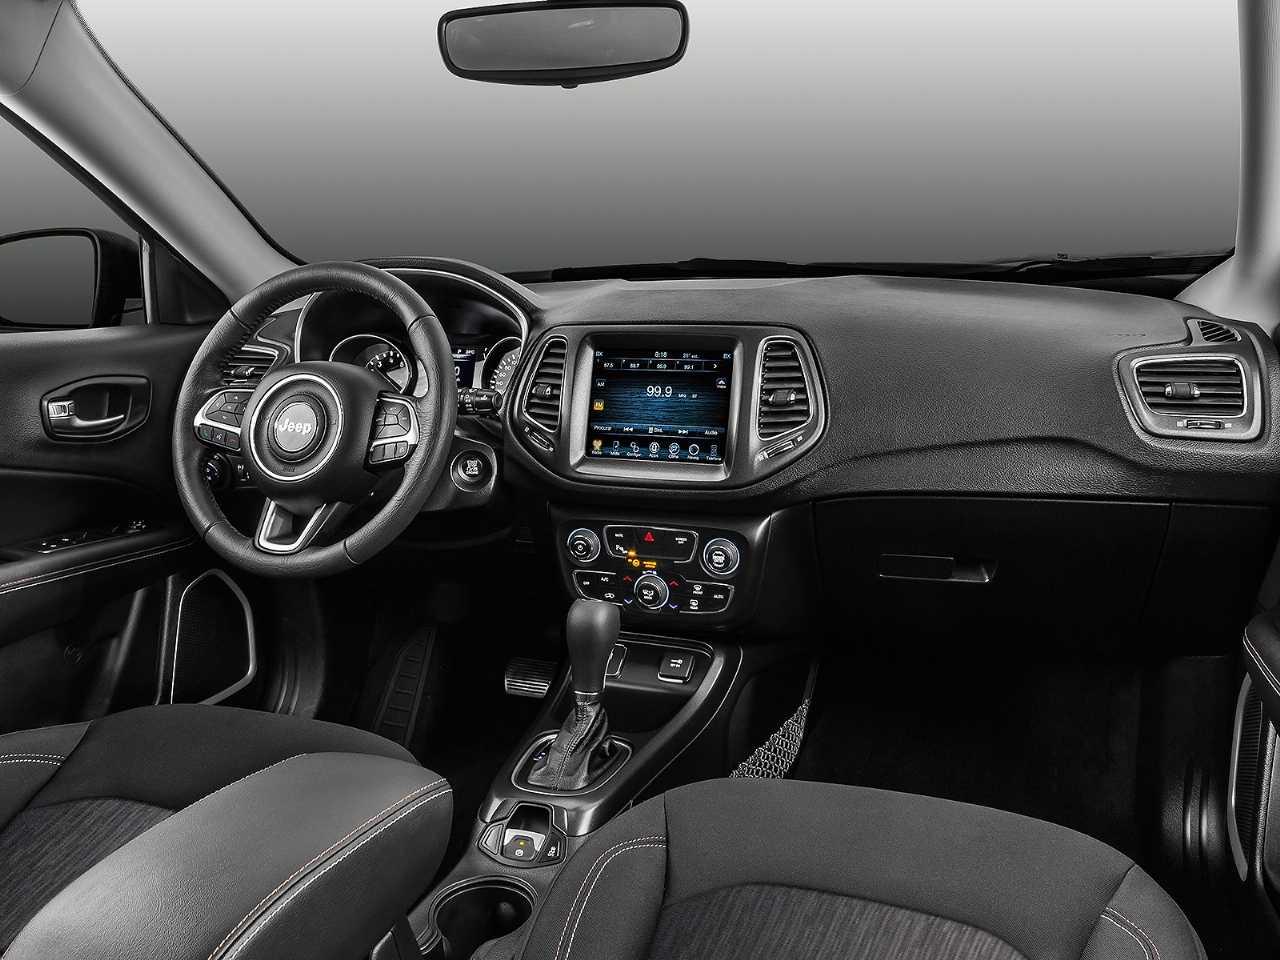 JeepCompass 2019 - painel